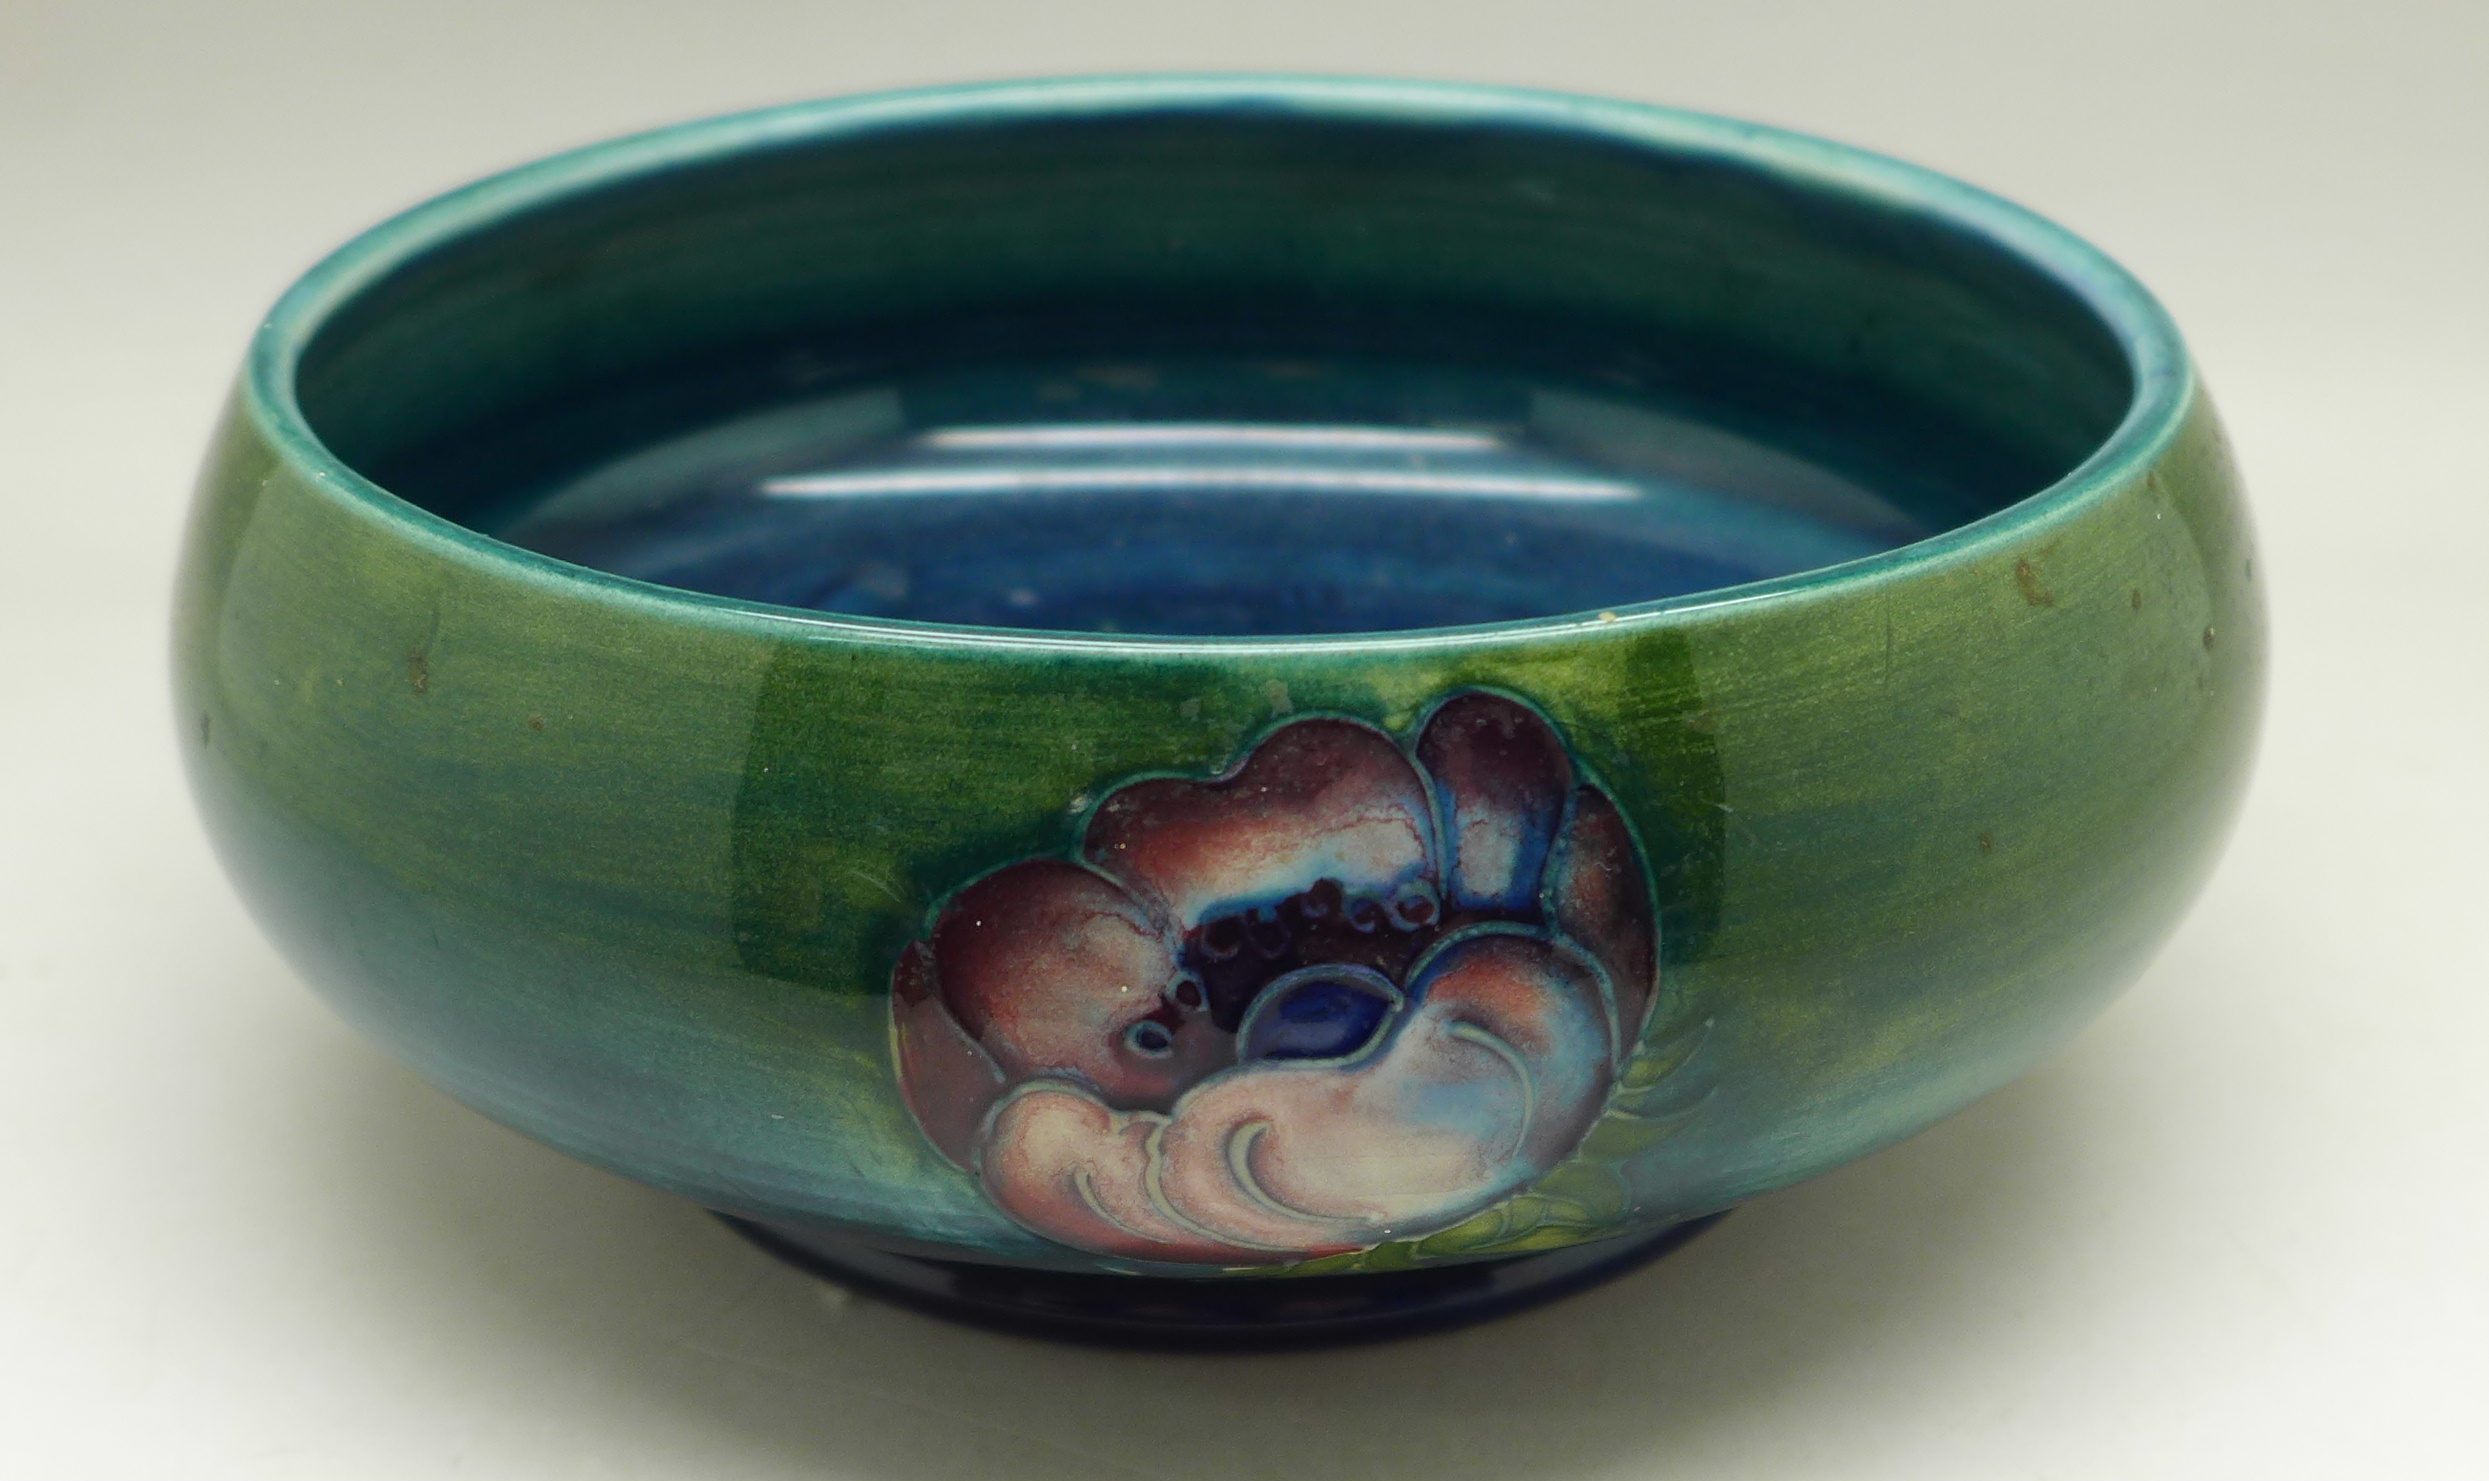 A Moorcroft anemone dish, 13.5cm diameter - Image 3 of 5